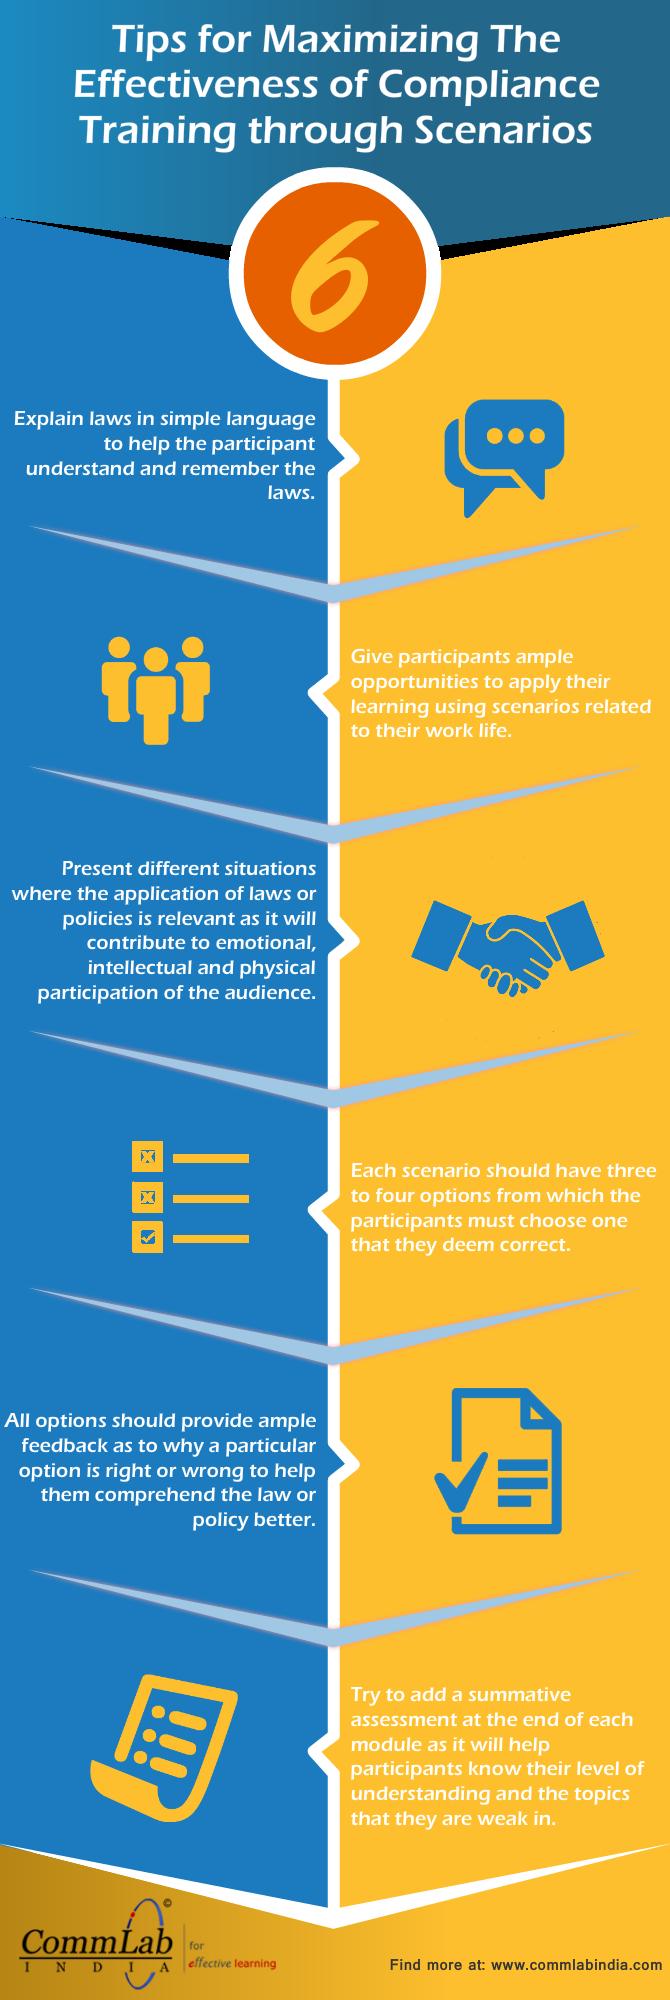 Maximizing Effectiveness of Compliance Training